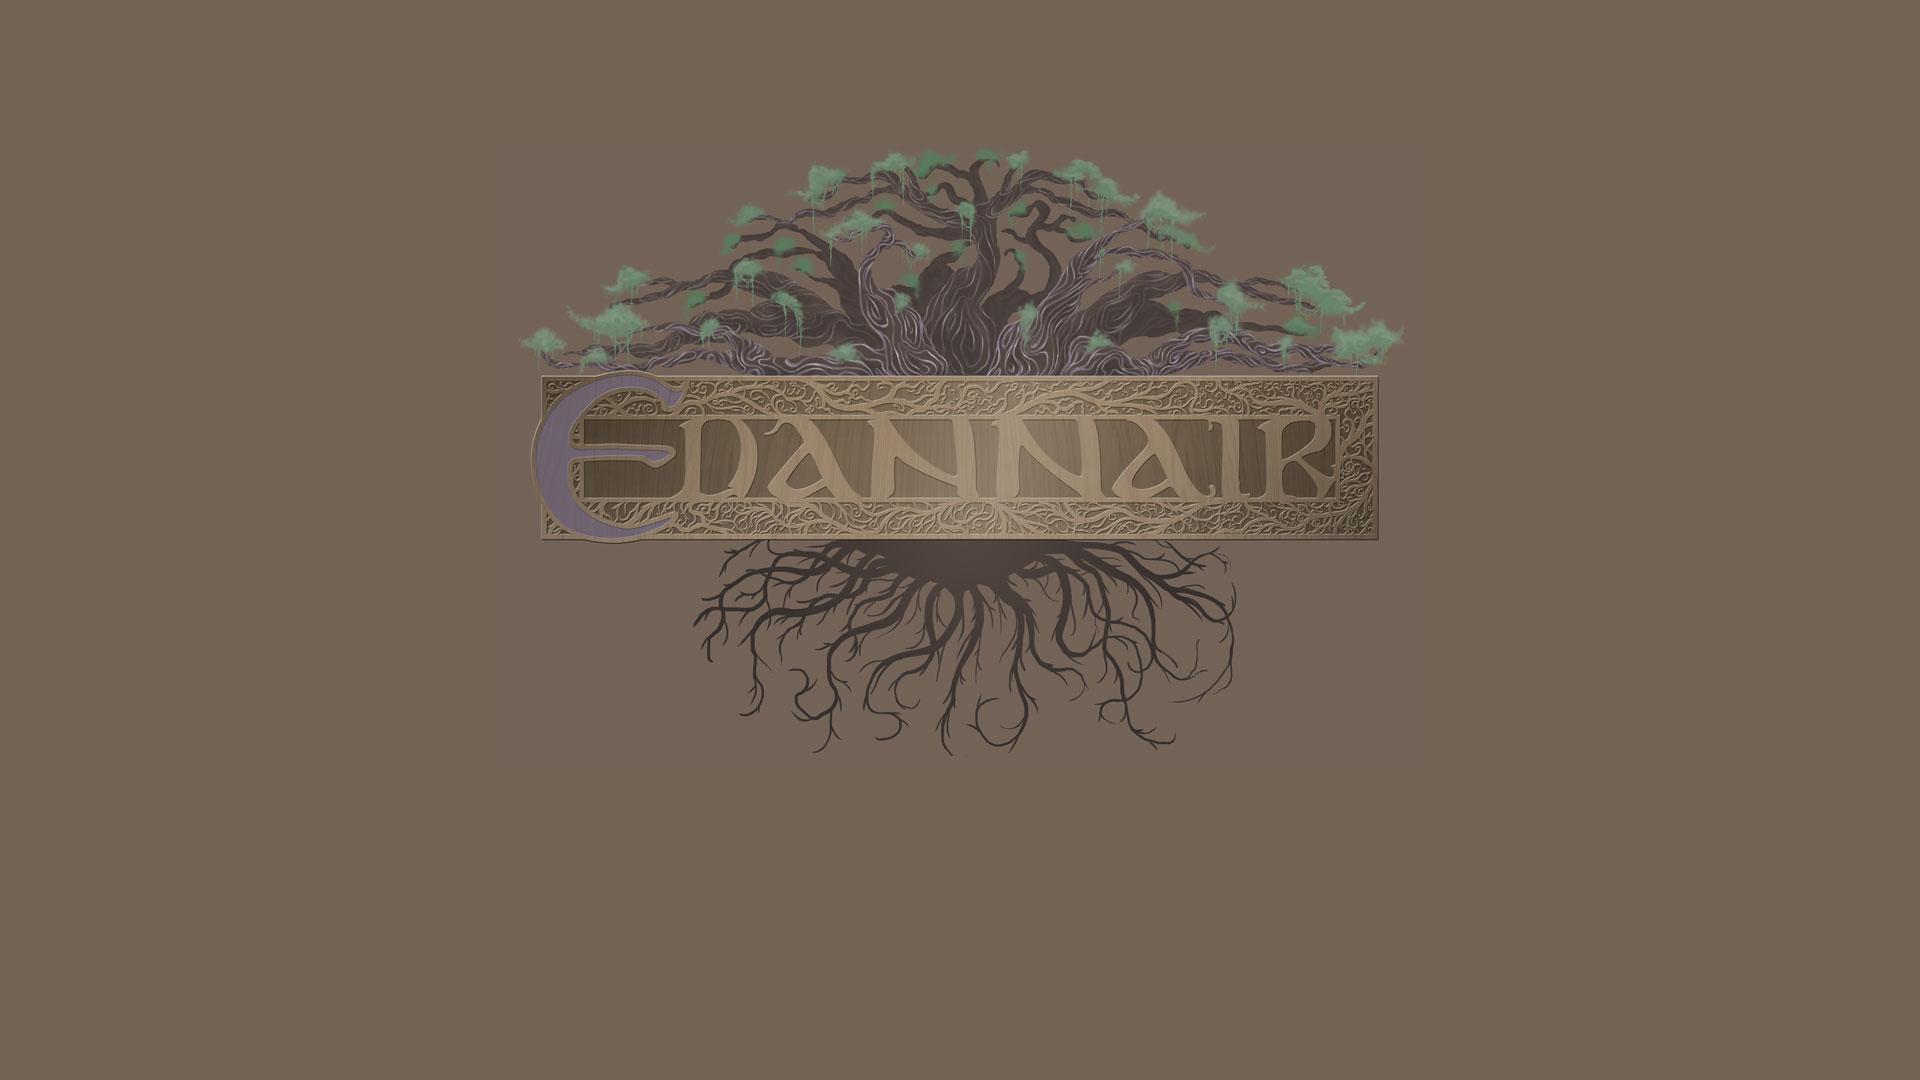 Edannair_Full_Page.jpg